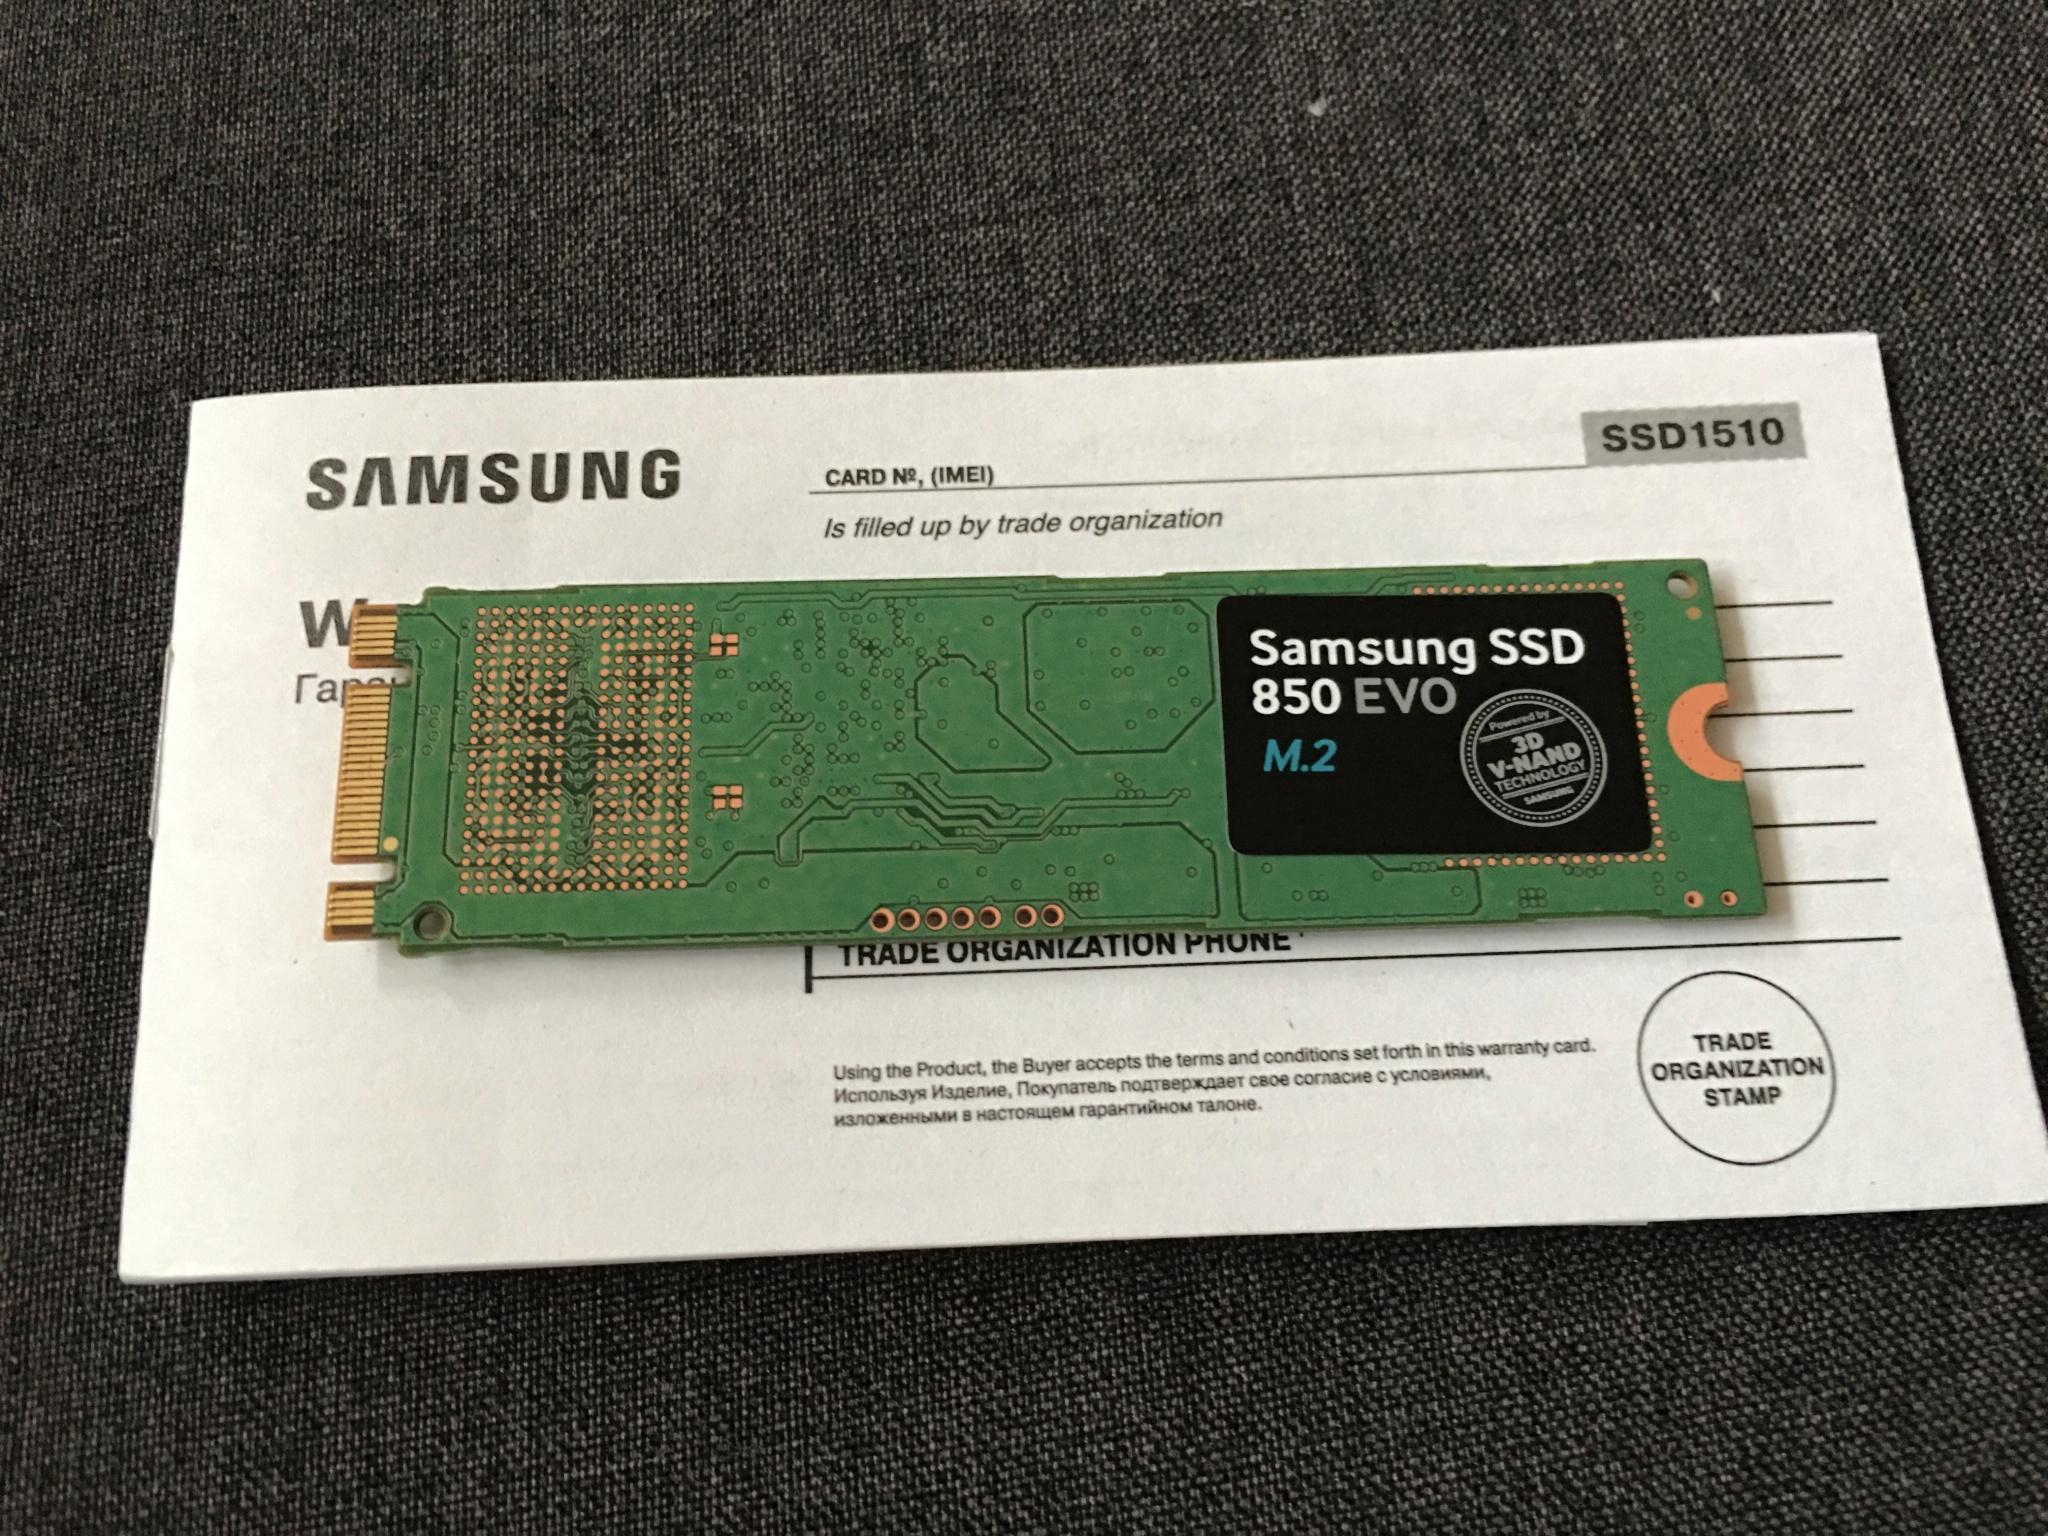 SAMSUNG 850 EVO M.2 500GB SATA III Internal SSD MZ-N5E500BW